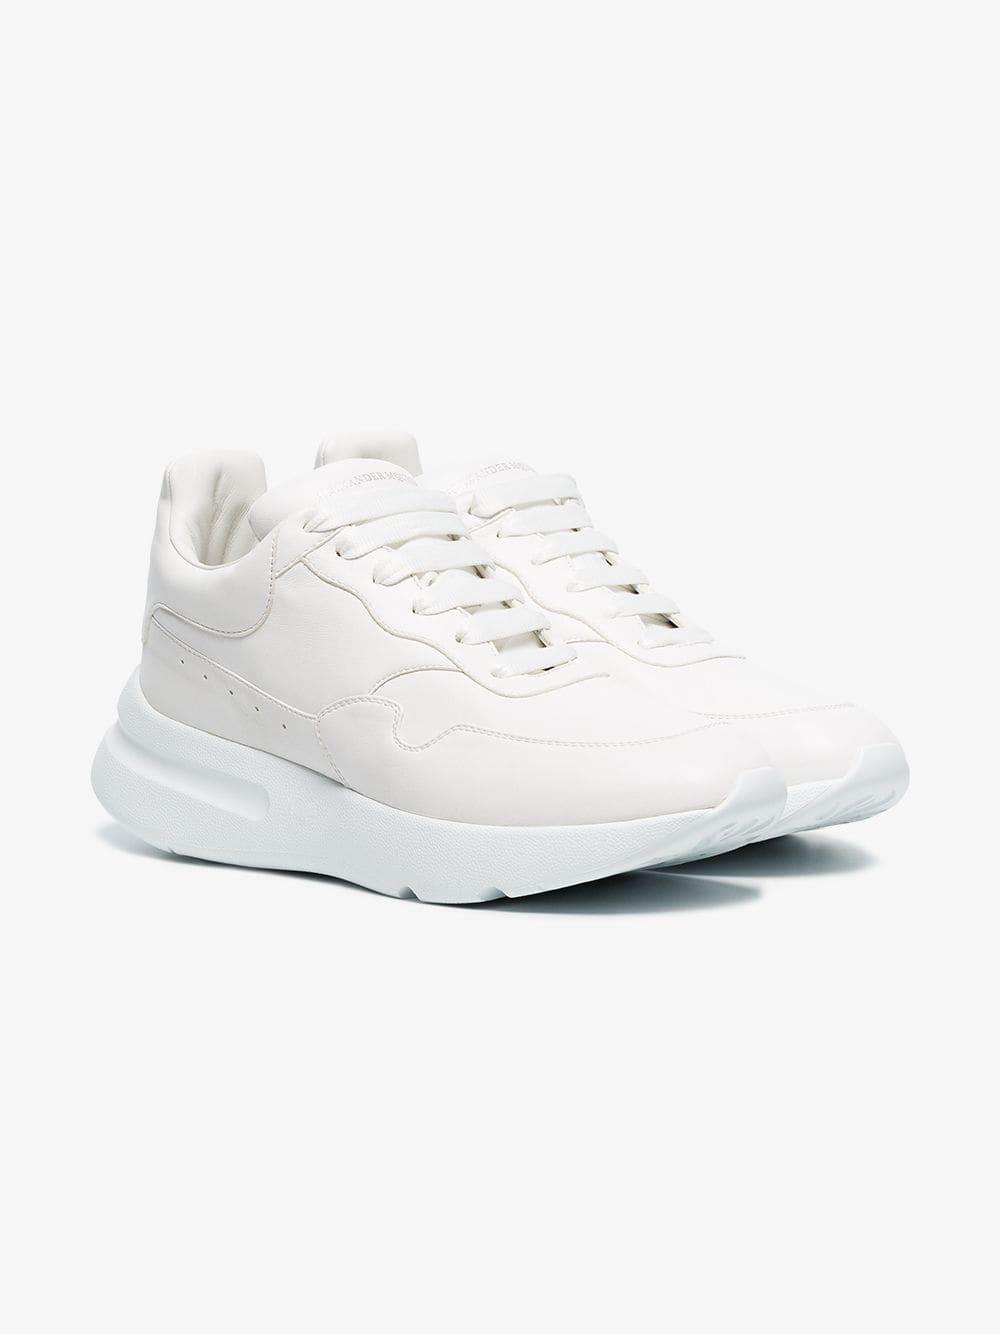 d105181a1192 Alexander McQueen Optical White Runner Oversized Leather Sneakers in White  for Men - Lyst